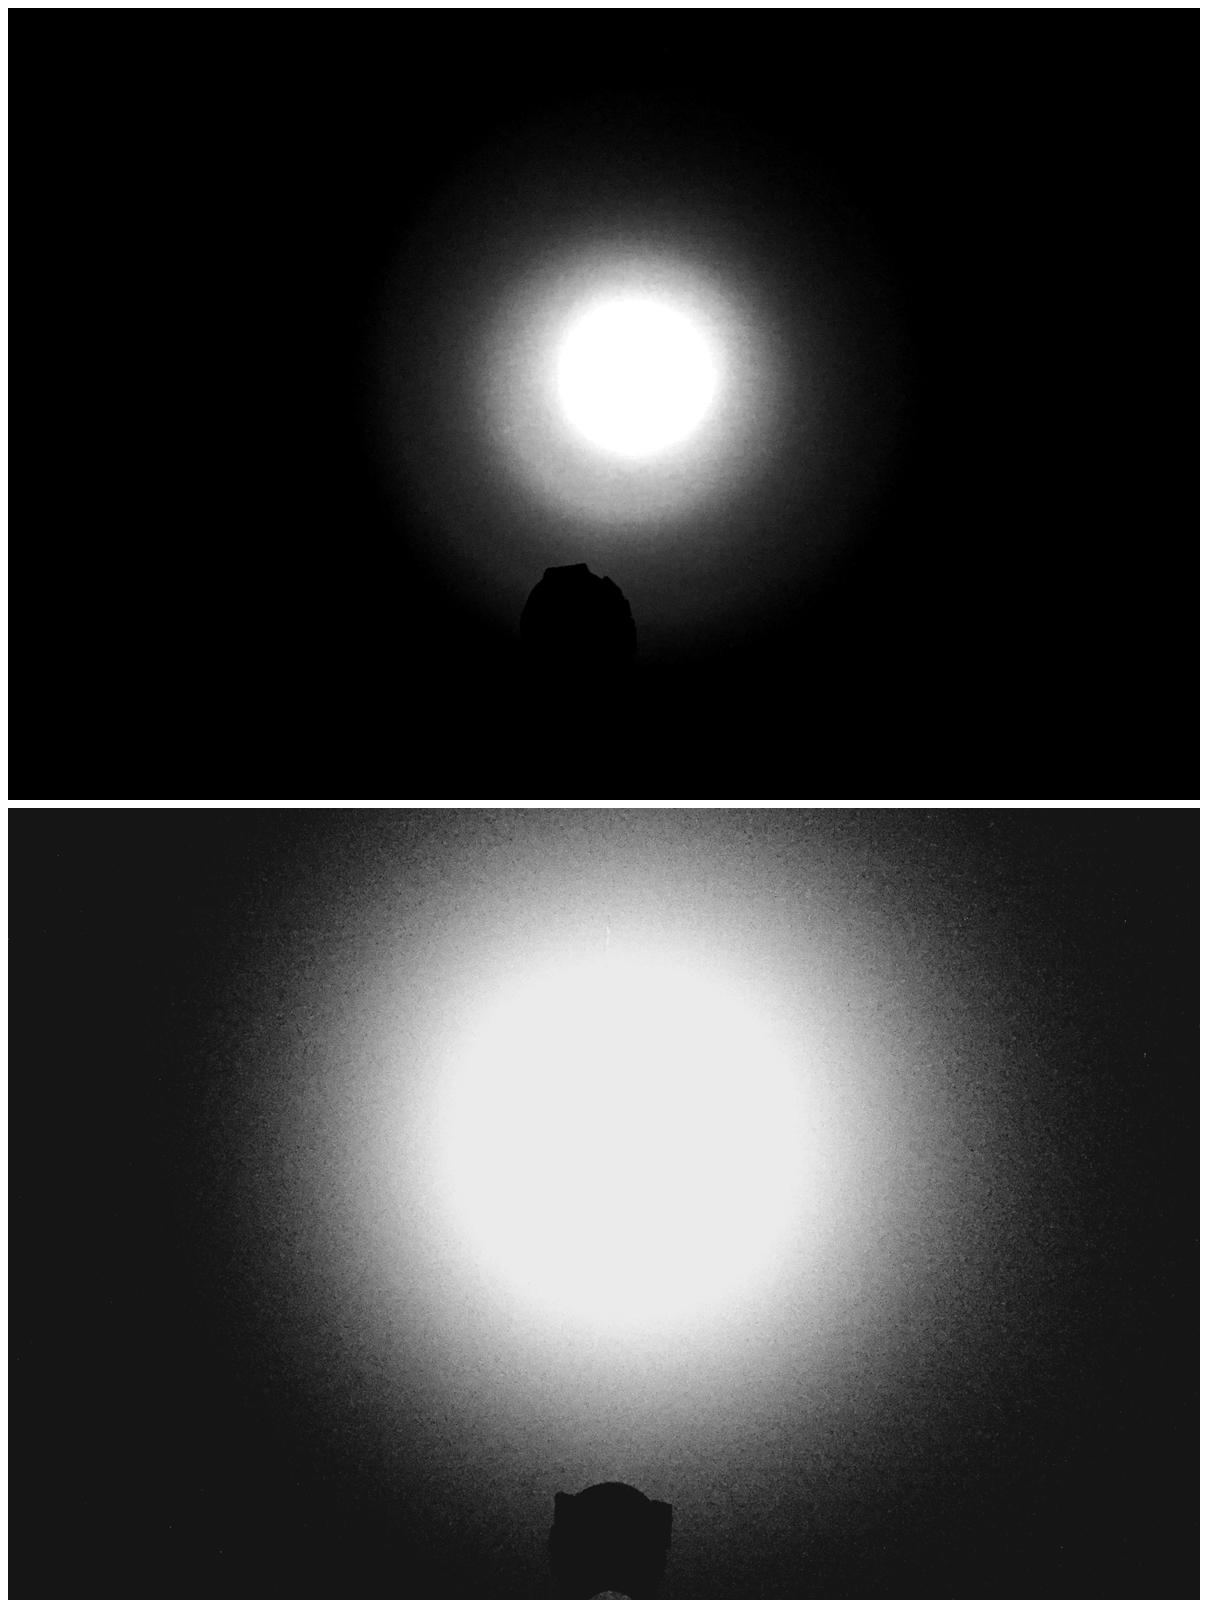 13 SUREFIRE FM44 FM4X 1.37 BEZEL VAMPIRE BEAM SHAPER M952V M900V IR シュアファイアー ビームシェーパー ウェポンライト カバー 検証 レビュー